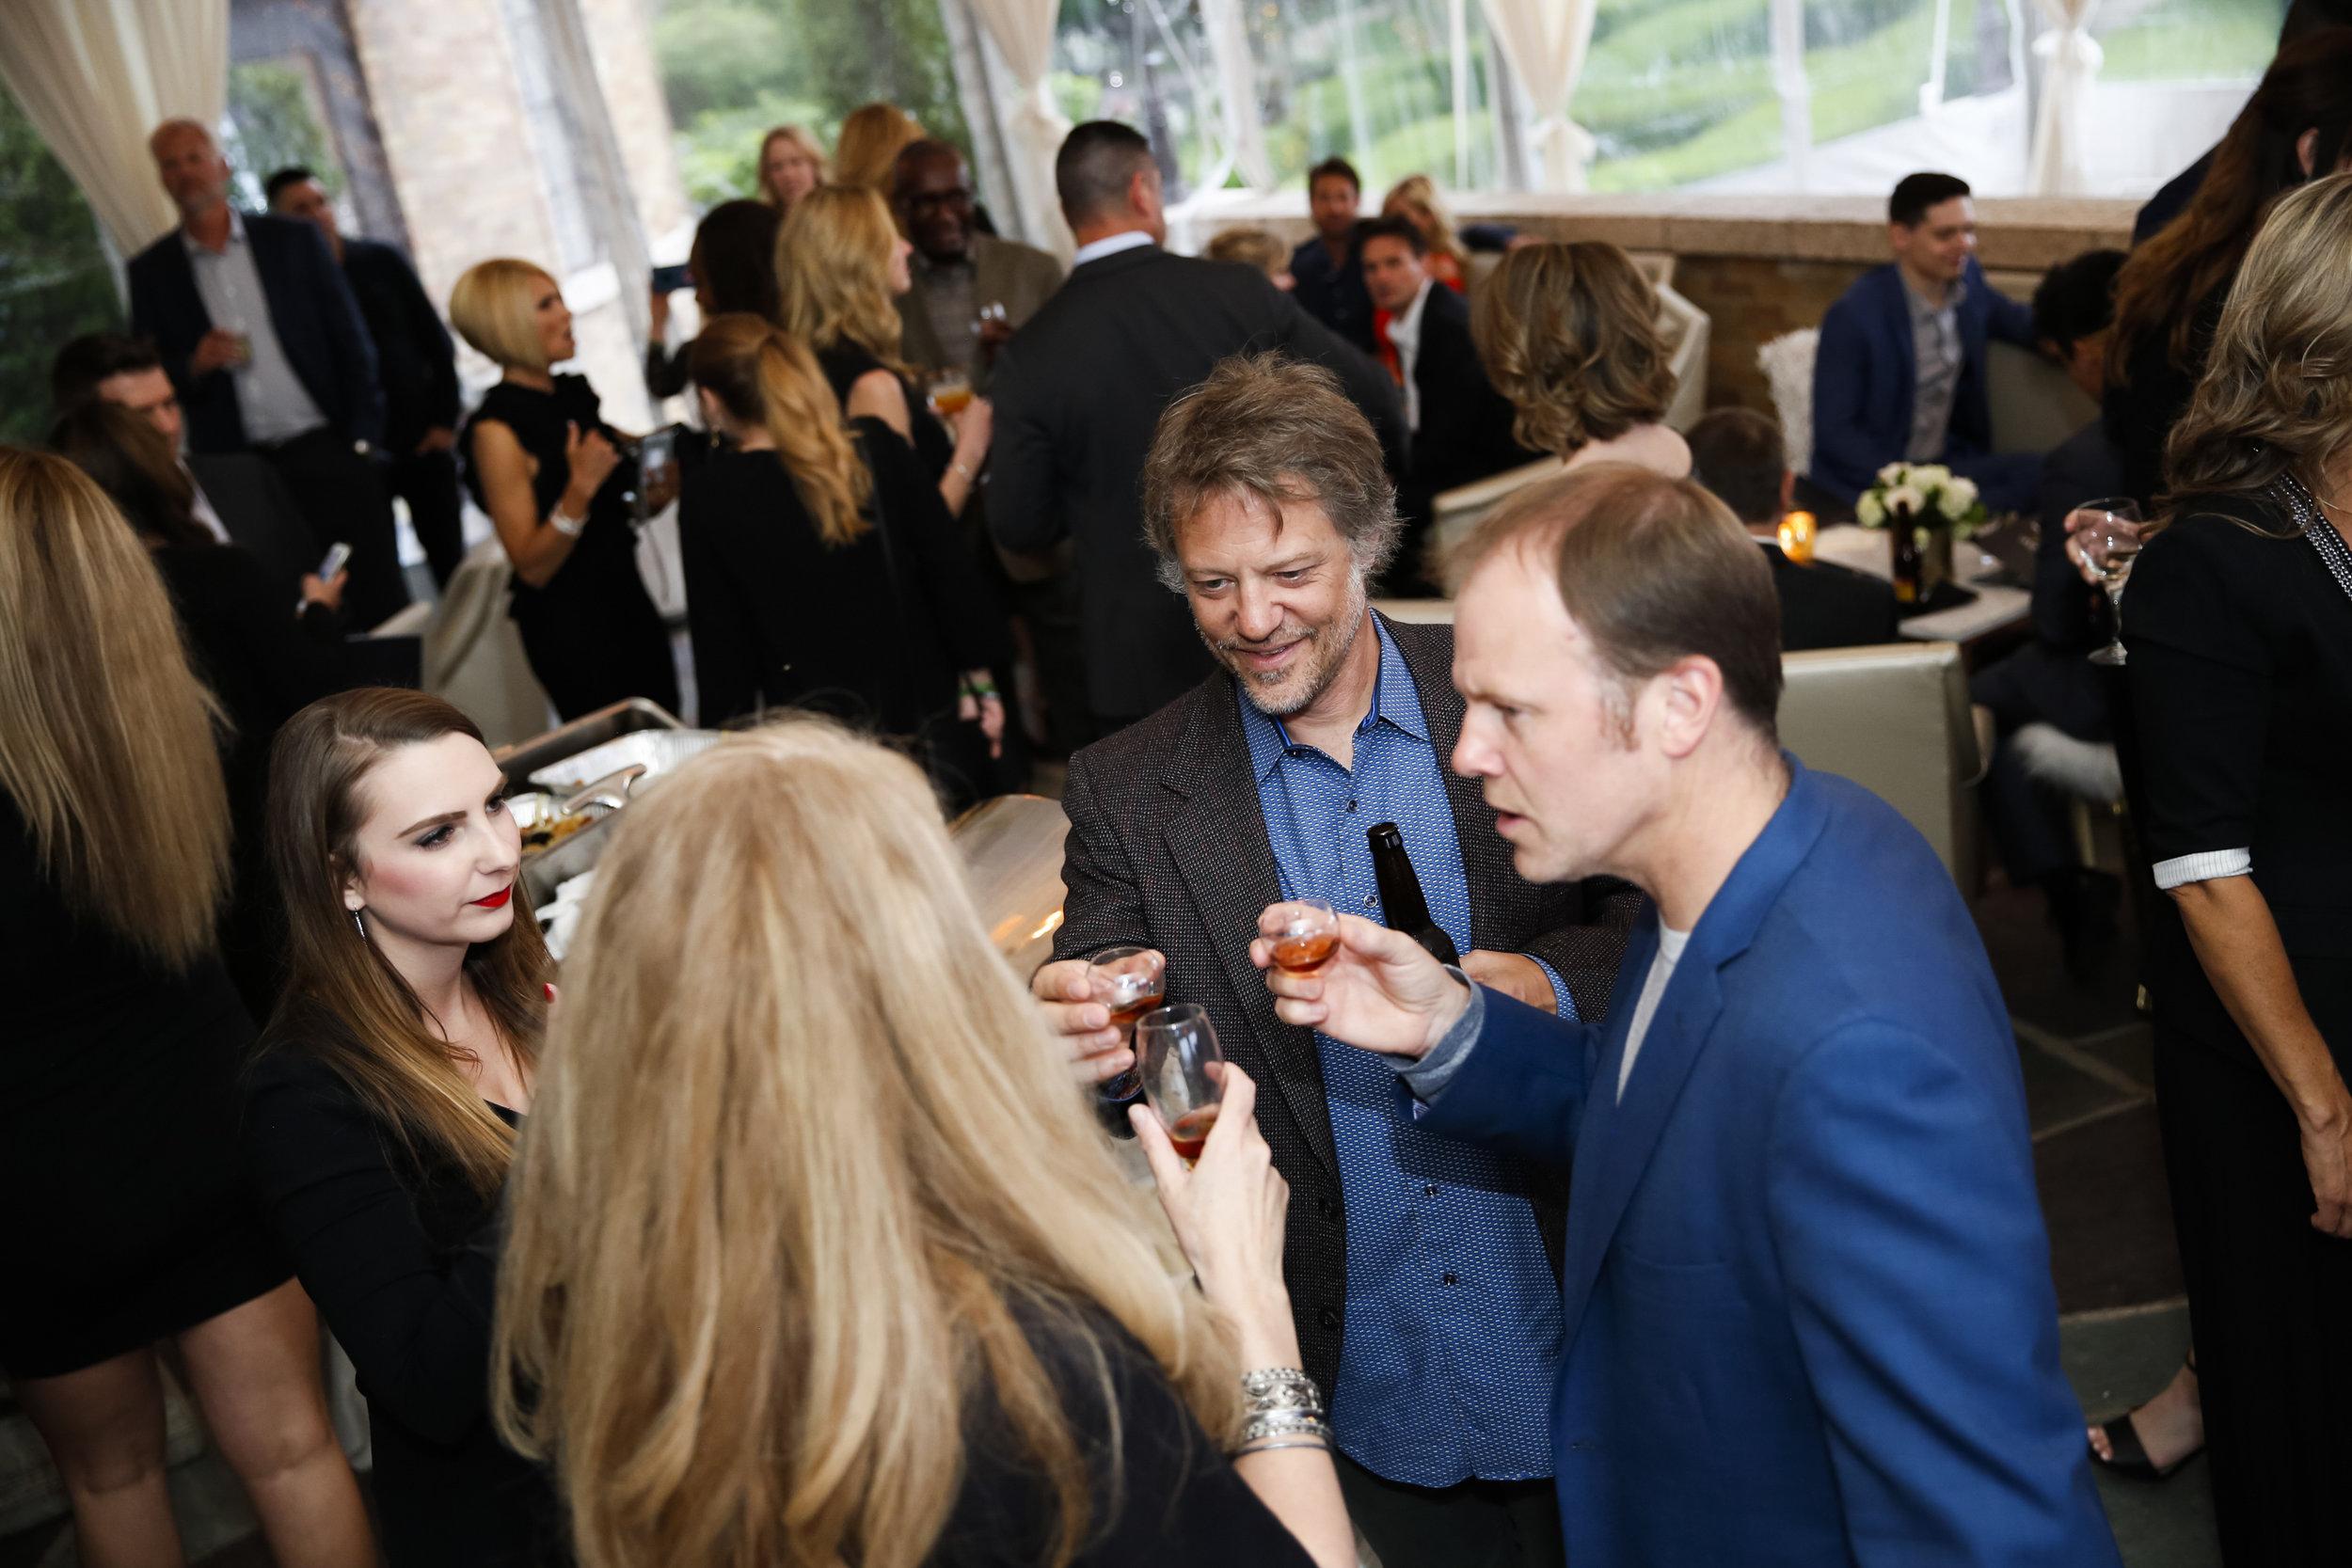 golf-give-gala-celebrity-michael-phelps-jason-day-event-photographer-madison-wi-38.jpg